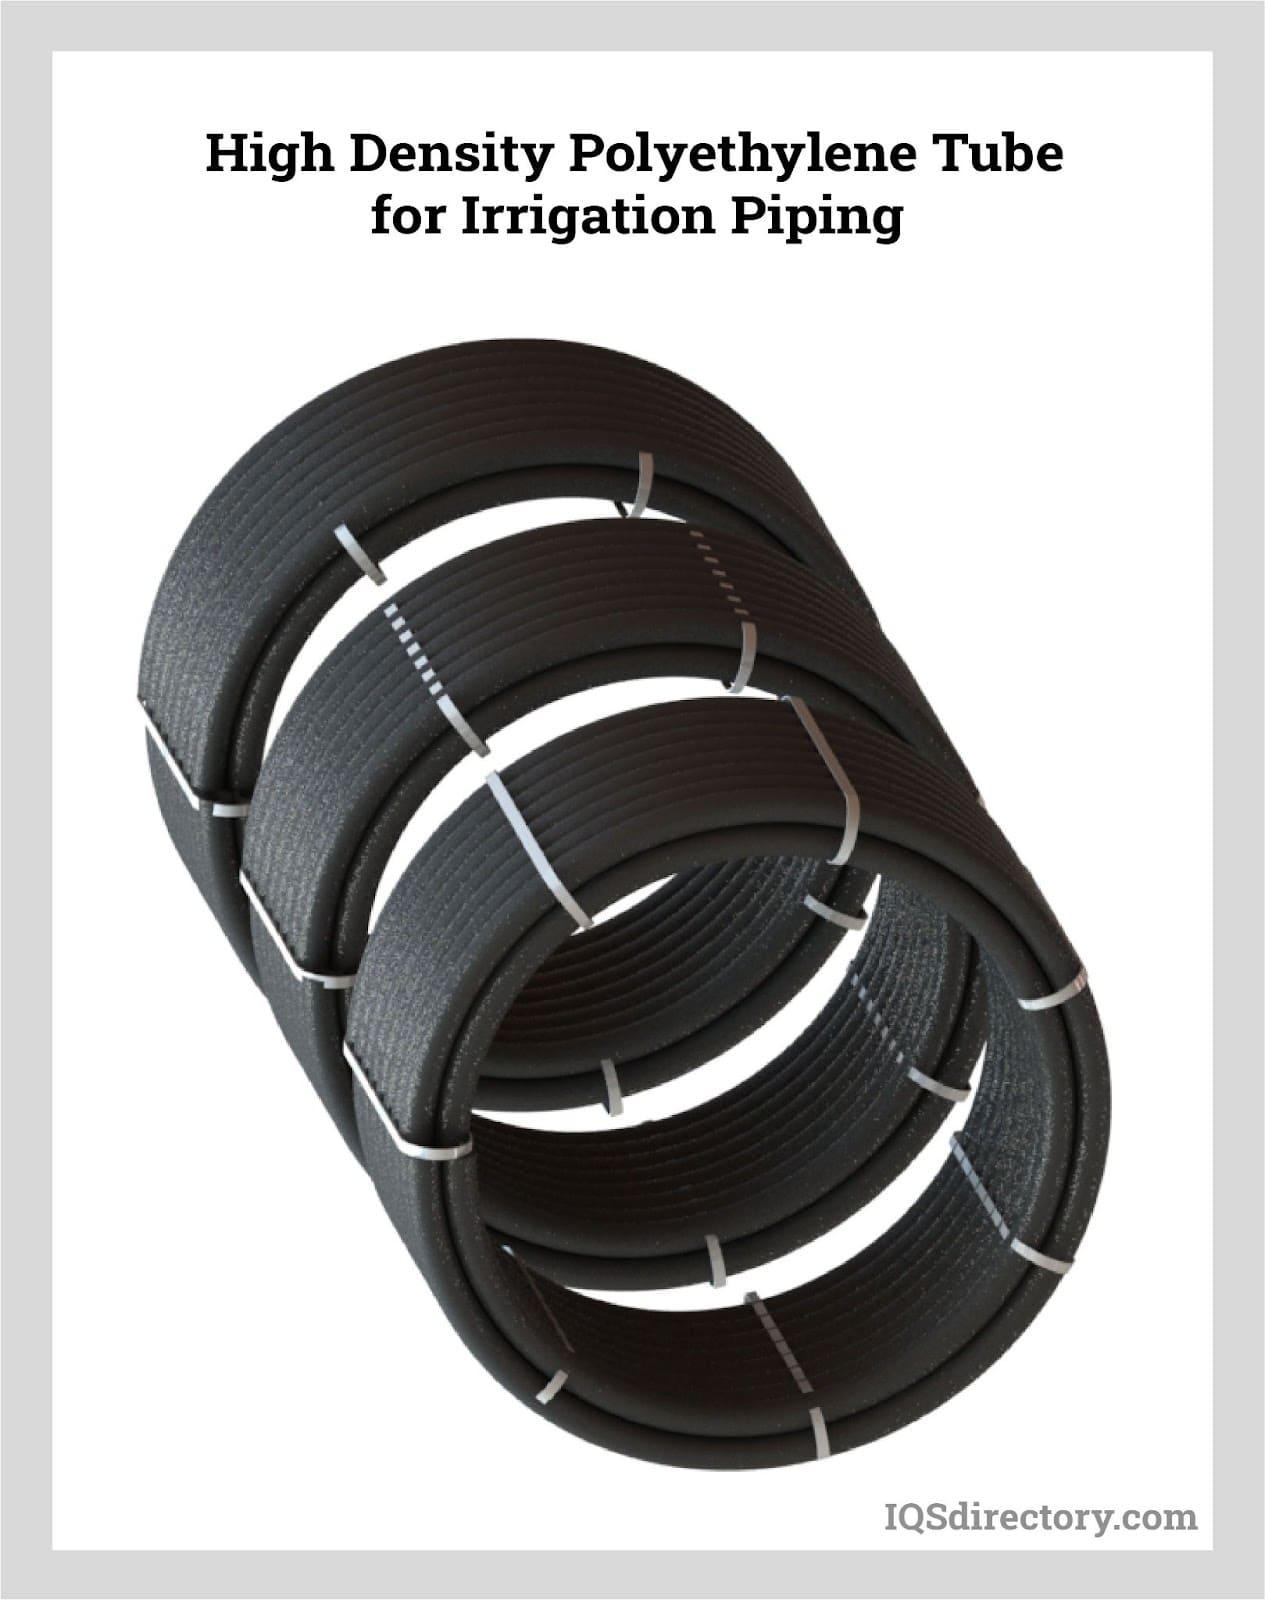 High Density Polyethylene Tube for Irrigation Piping